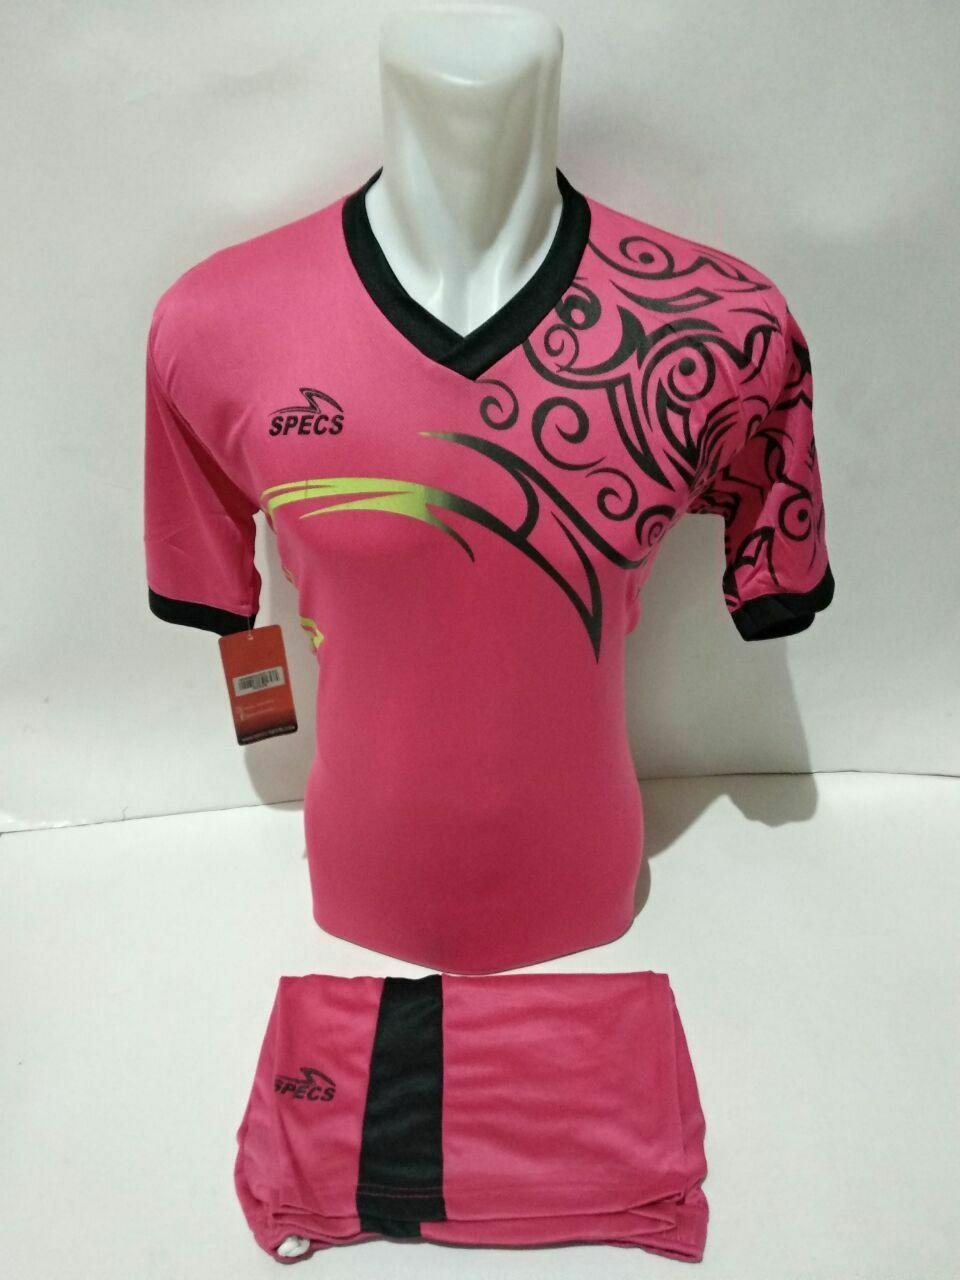 Setelan Jersey Baju Futsal / Volly Specs